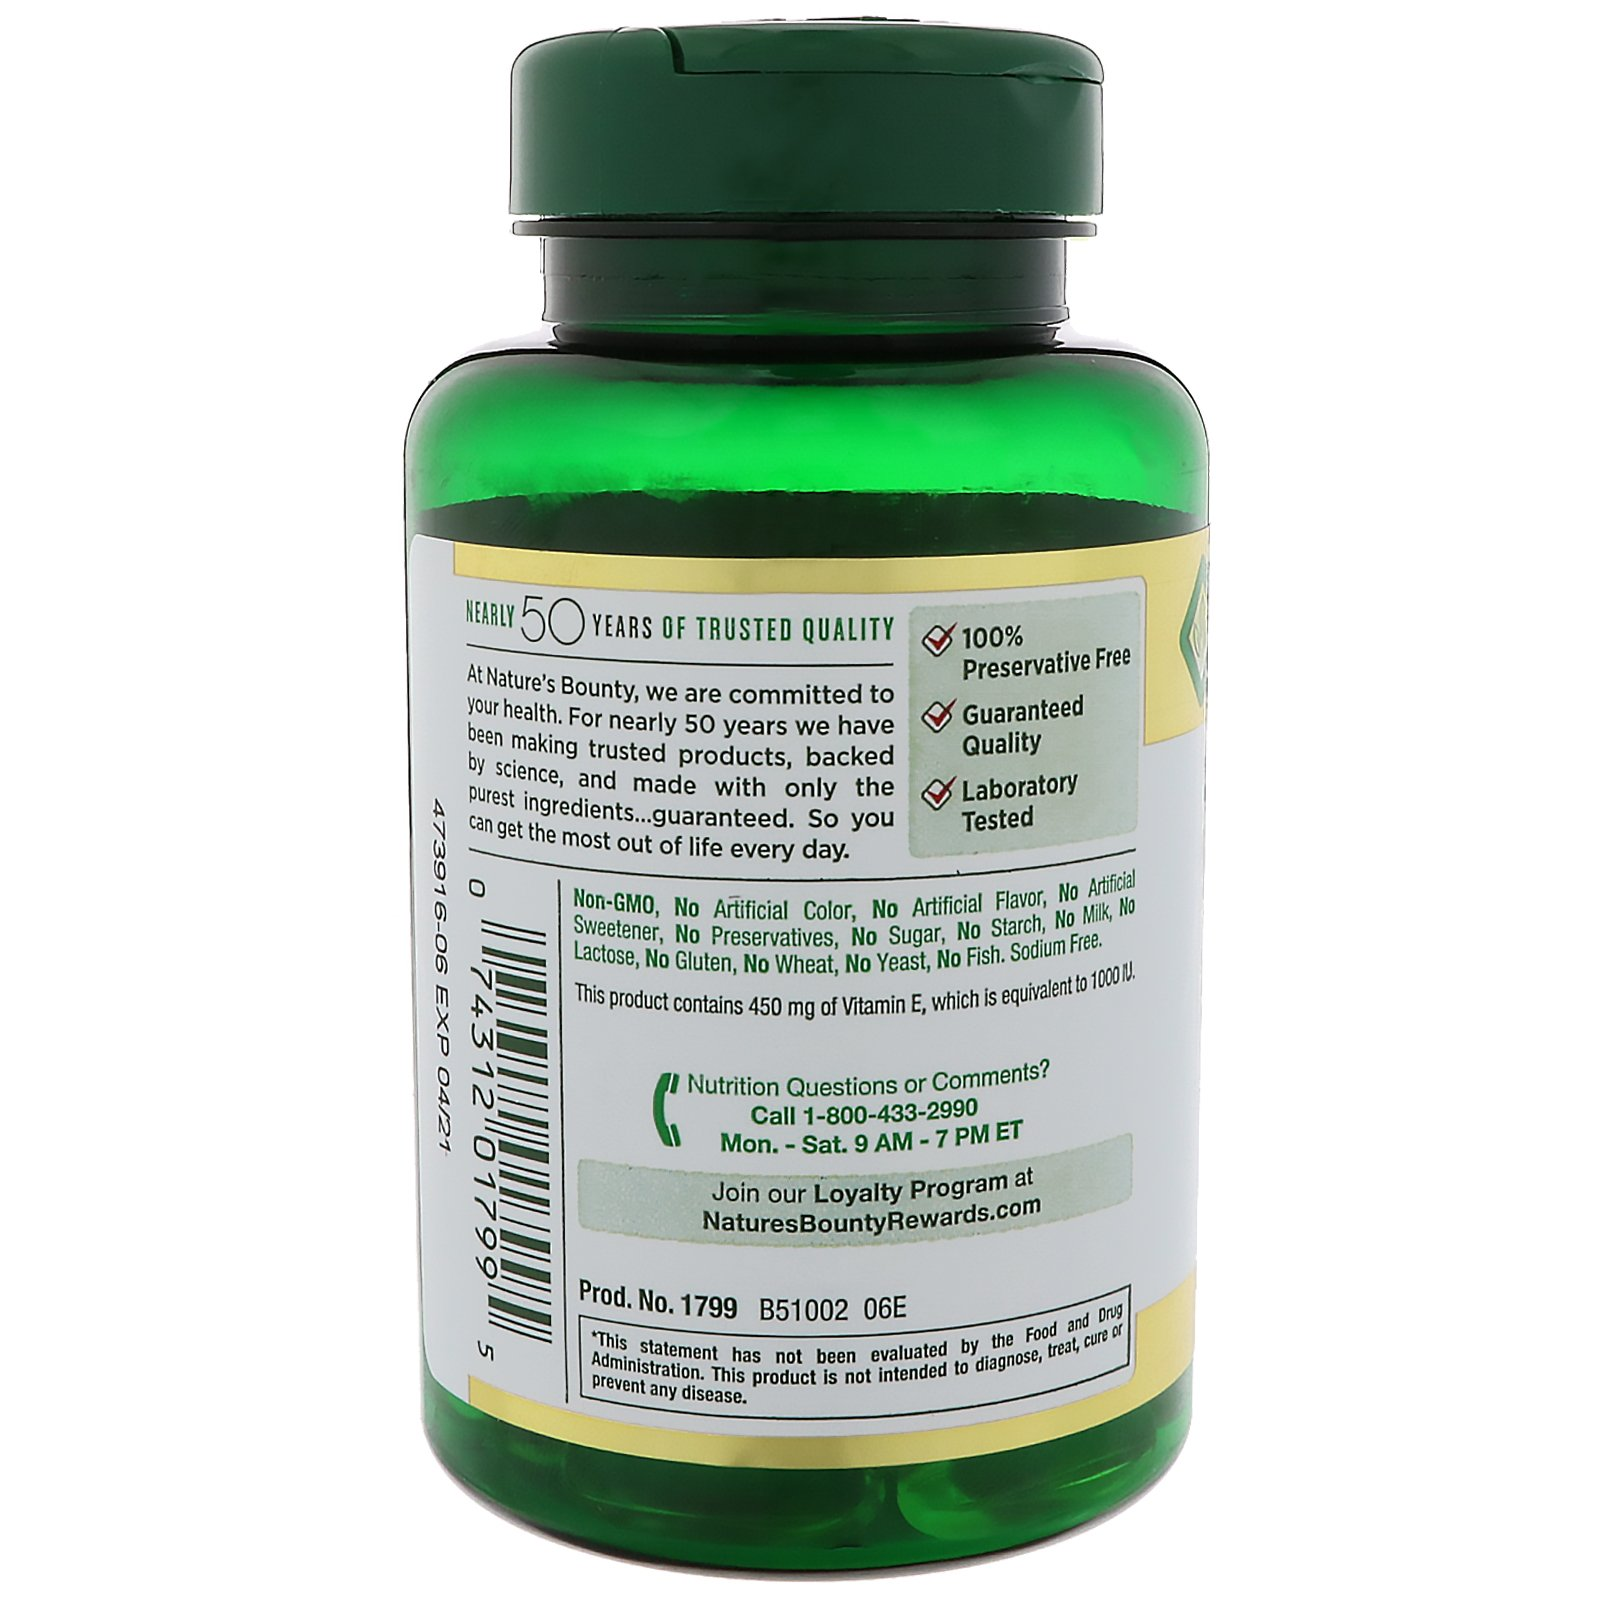 Nature's Bounty Vitamin E 1000 IU Softgels Pure DL-Alpha 60 Soft Gels (Pack of 5)